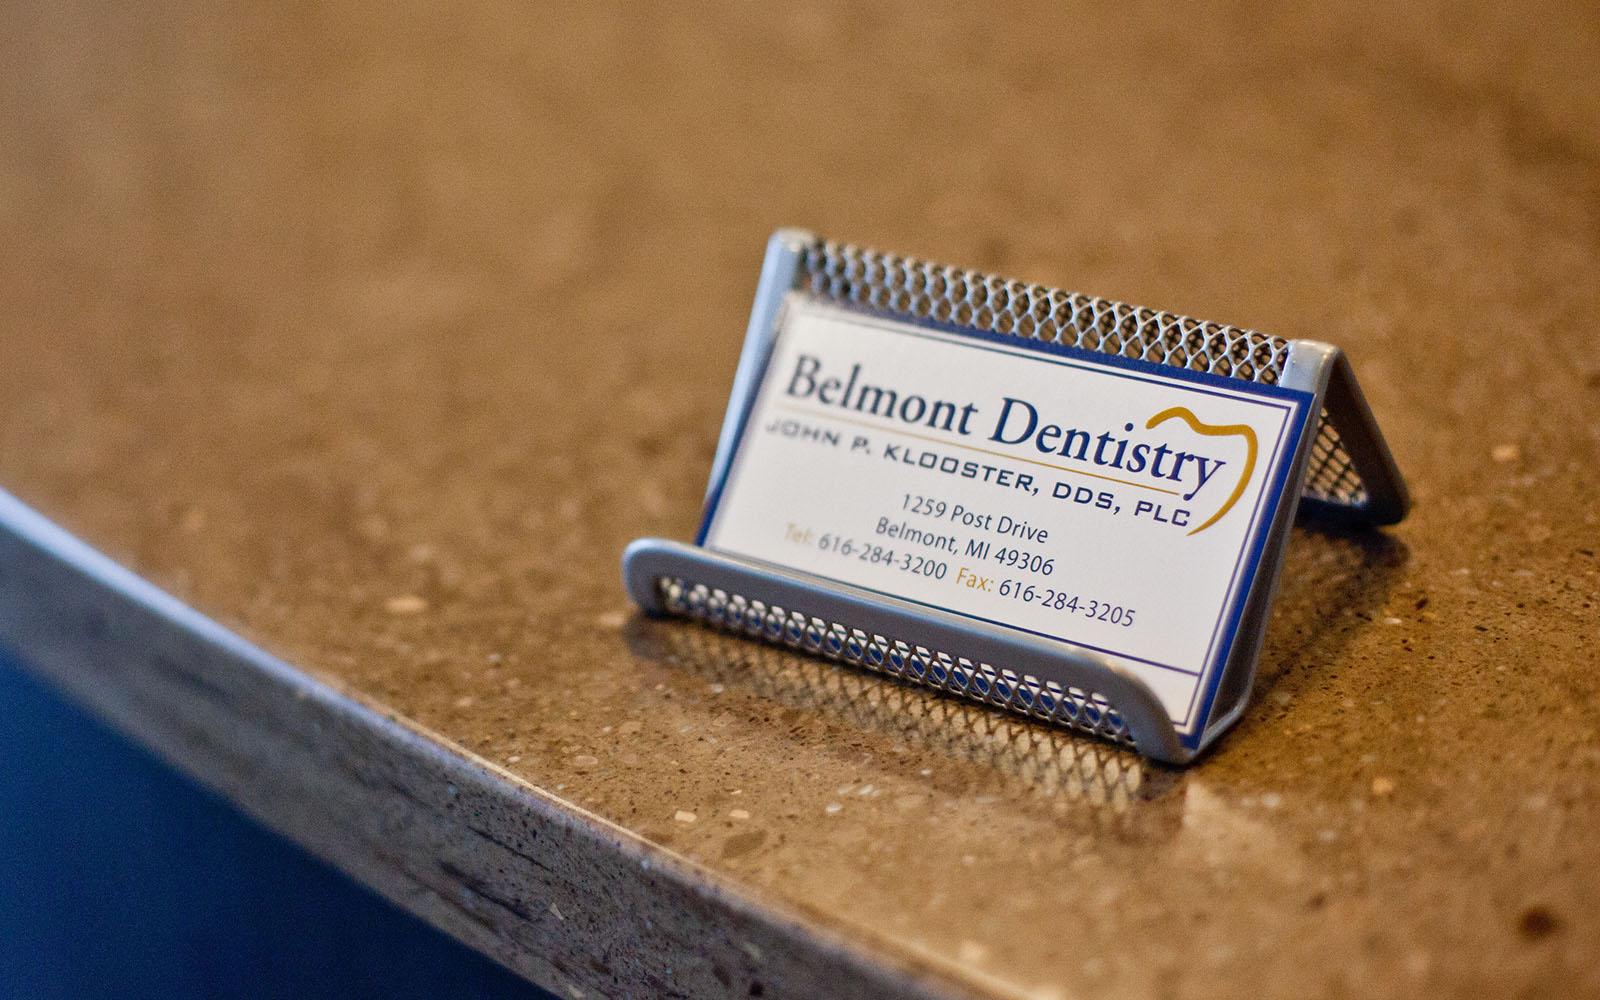 Belmont dentist top reviews